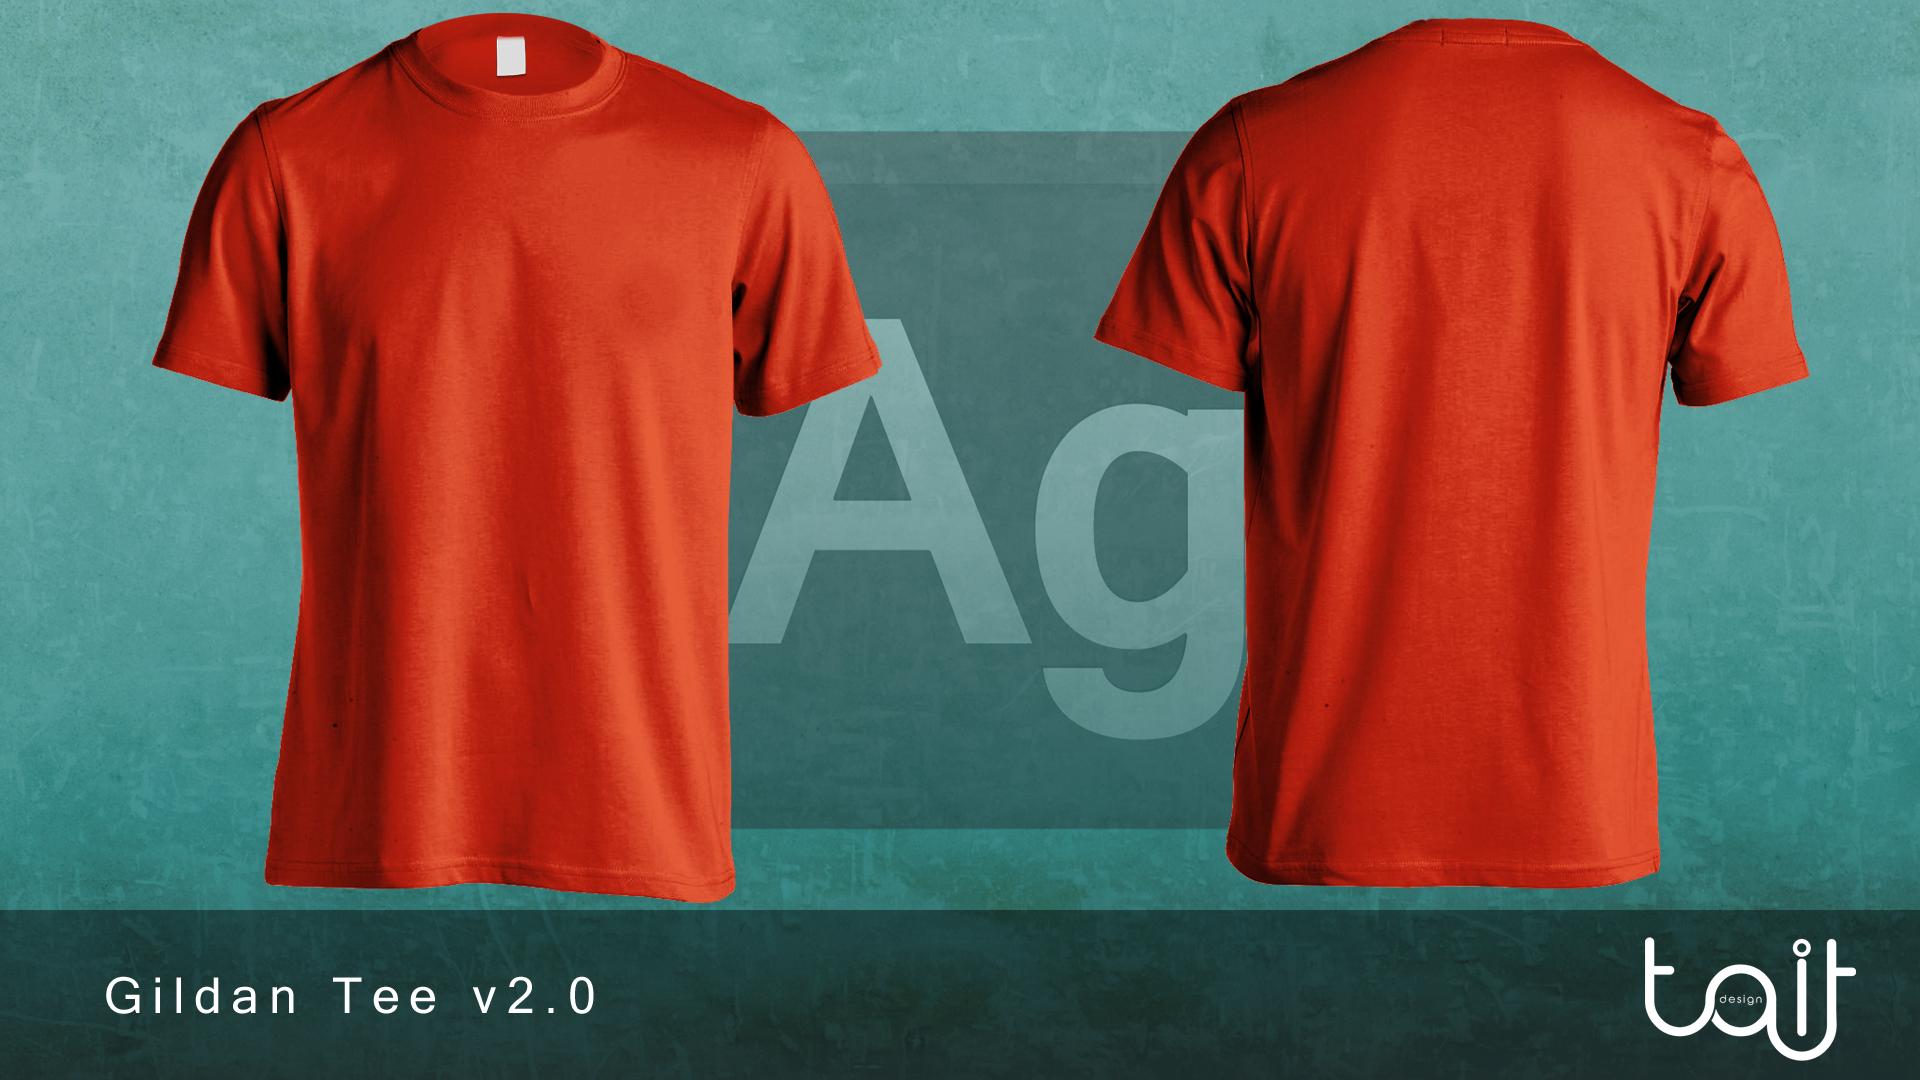 Download Gildan Tee V2 0 By Theapparelguy Deviantart Com On Deviantart Shirt Mockup Shirt Template Tshirt Mockup